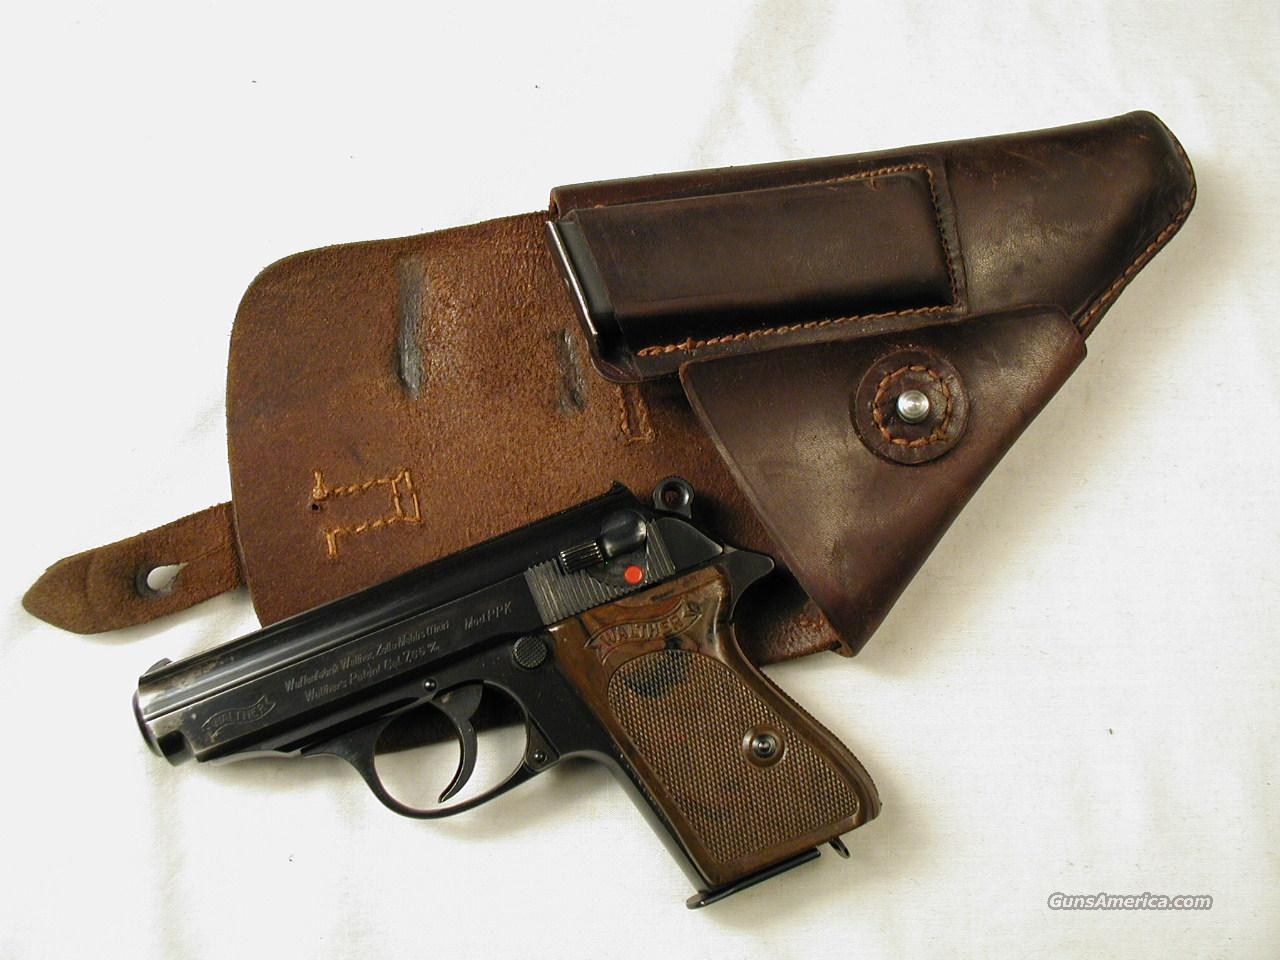 WALTHER PRE WAR PPK  Guns > Pistols > Walther Pistols > Pre-1945 > PPK